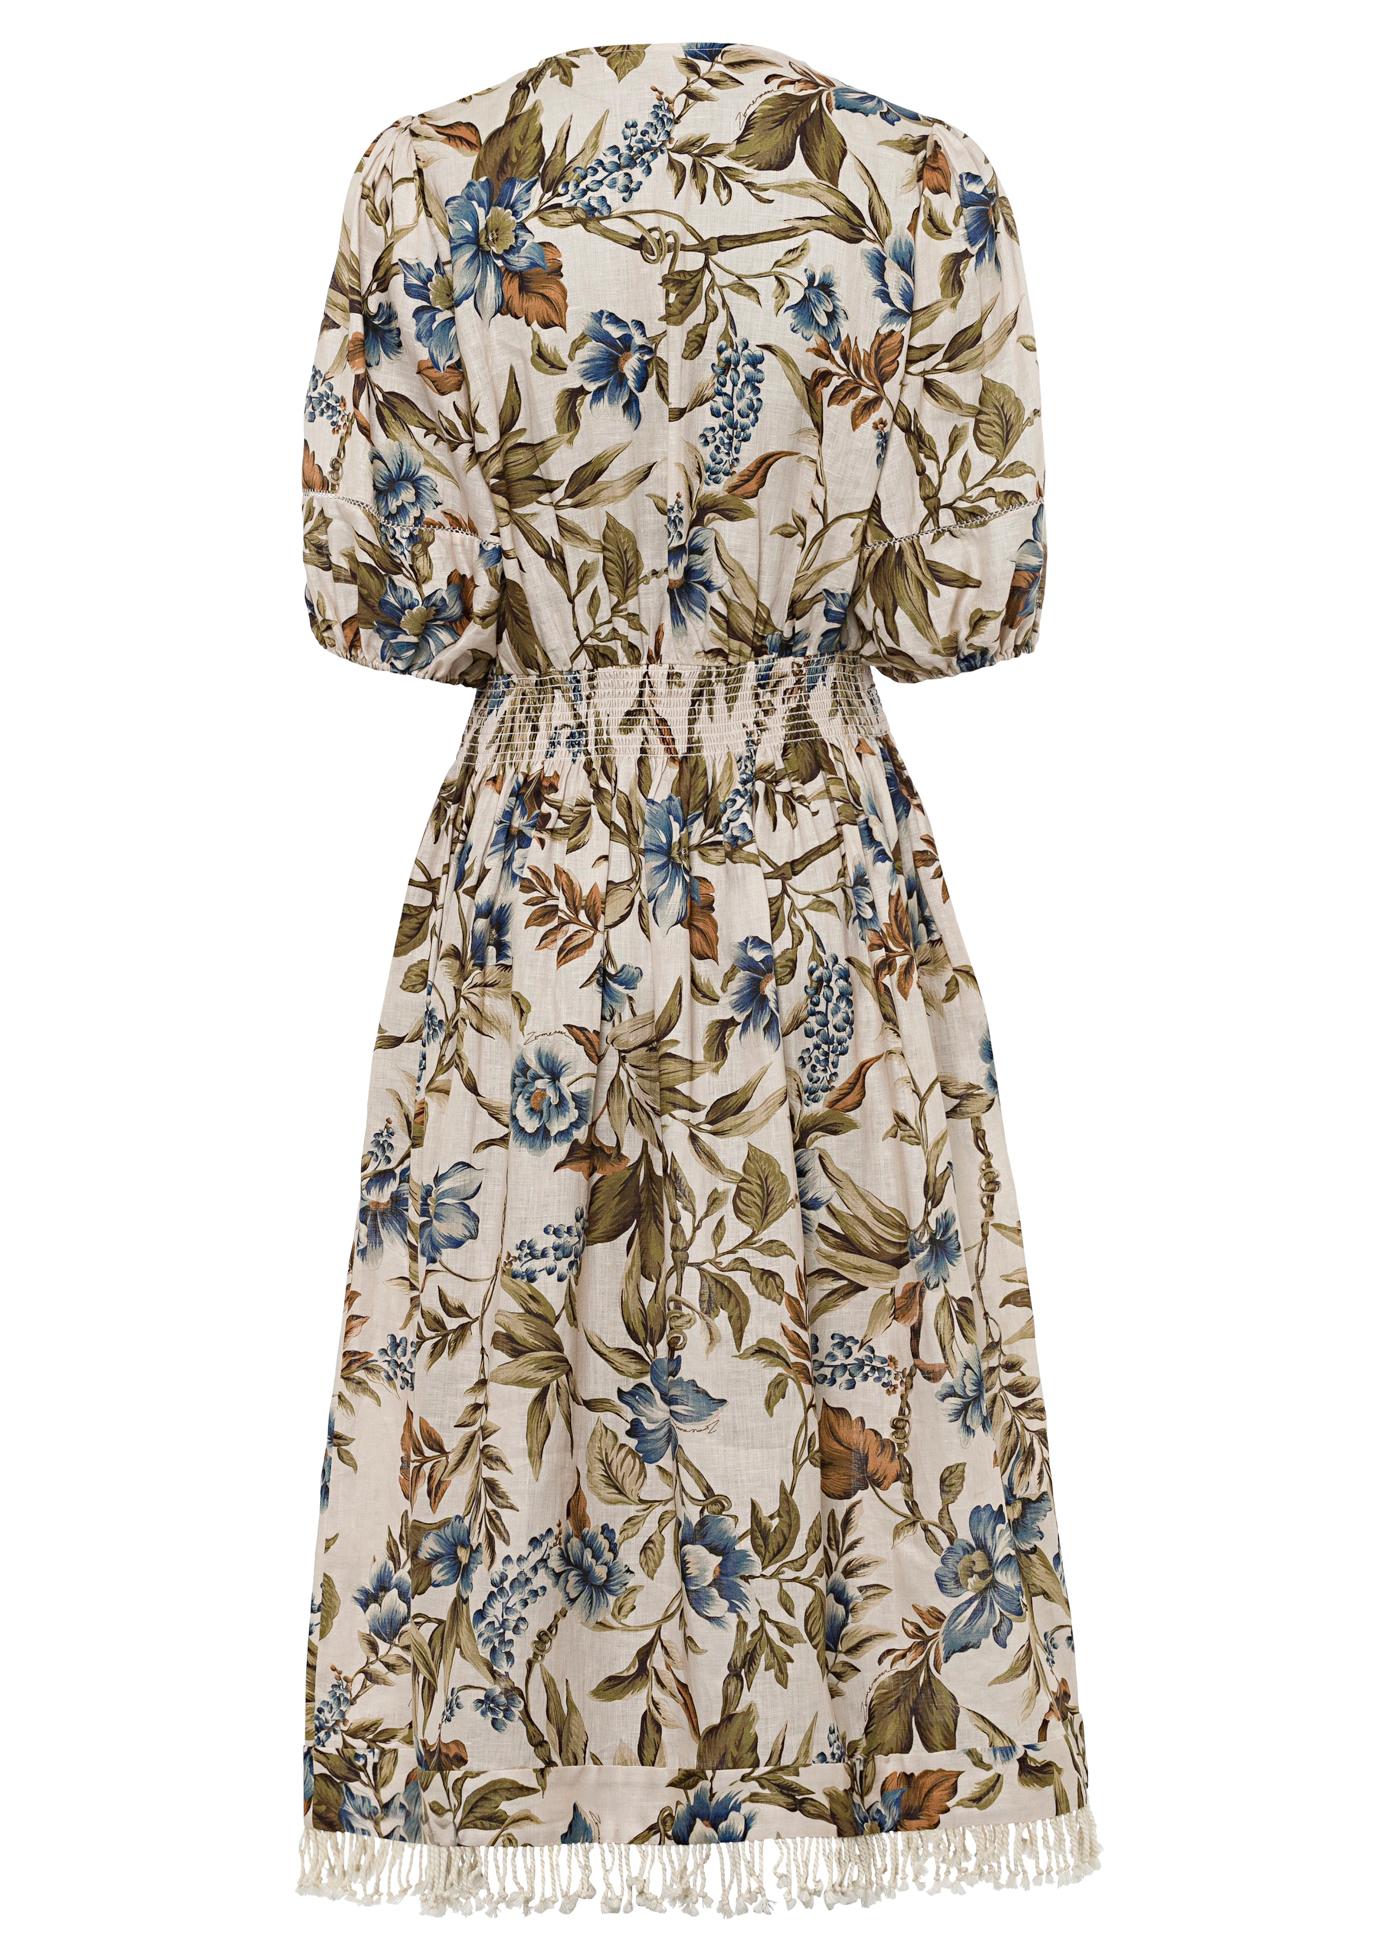 Aliane Shirred Waist Dress image number 1